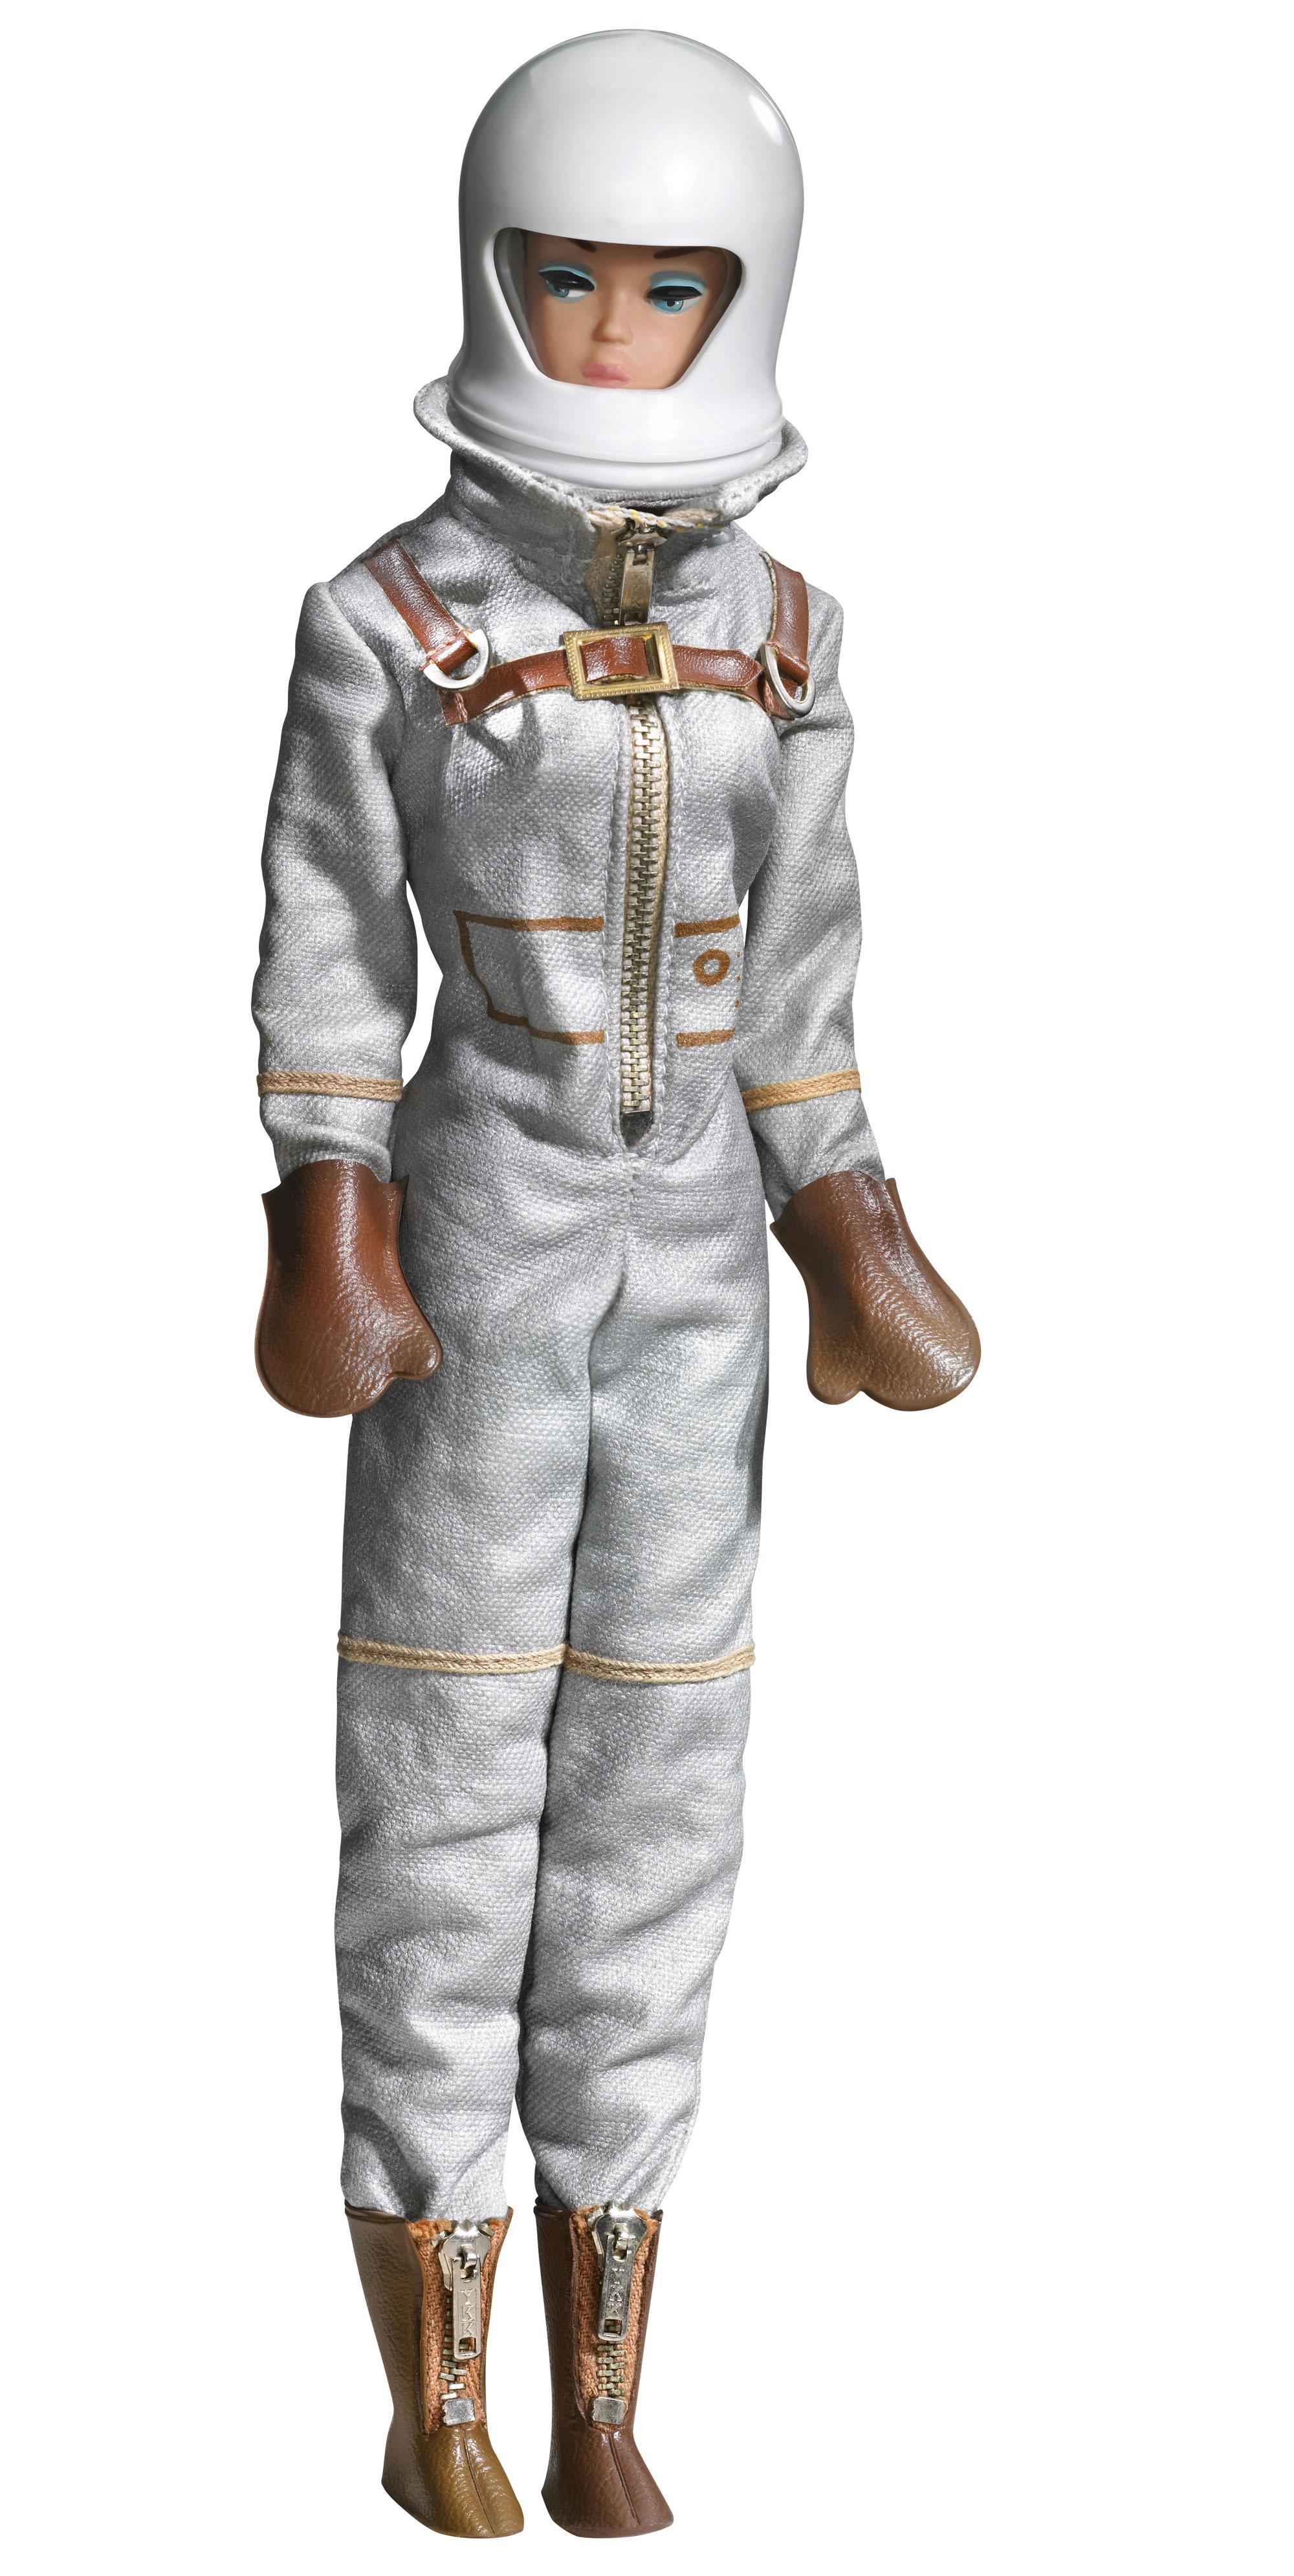 Barbie astronauta 1965